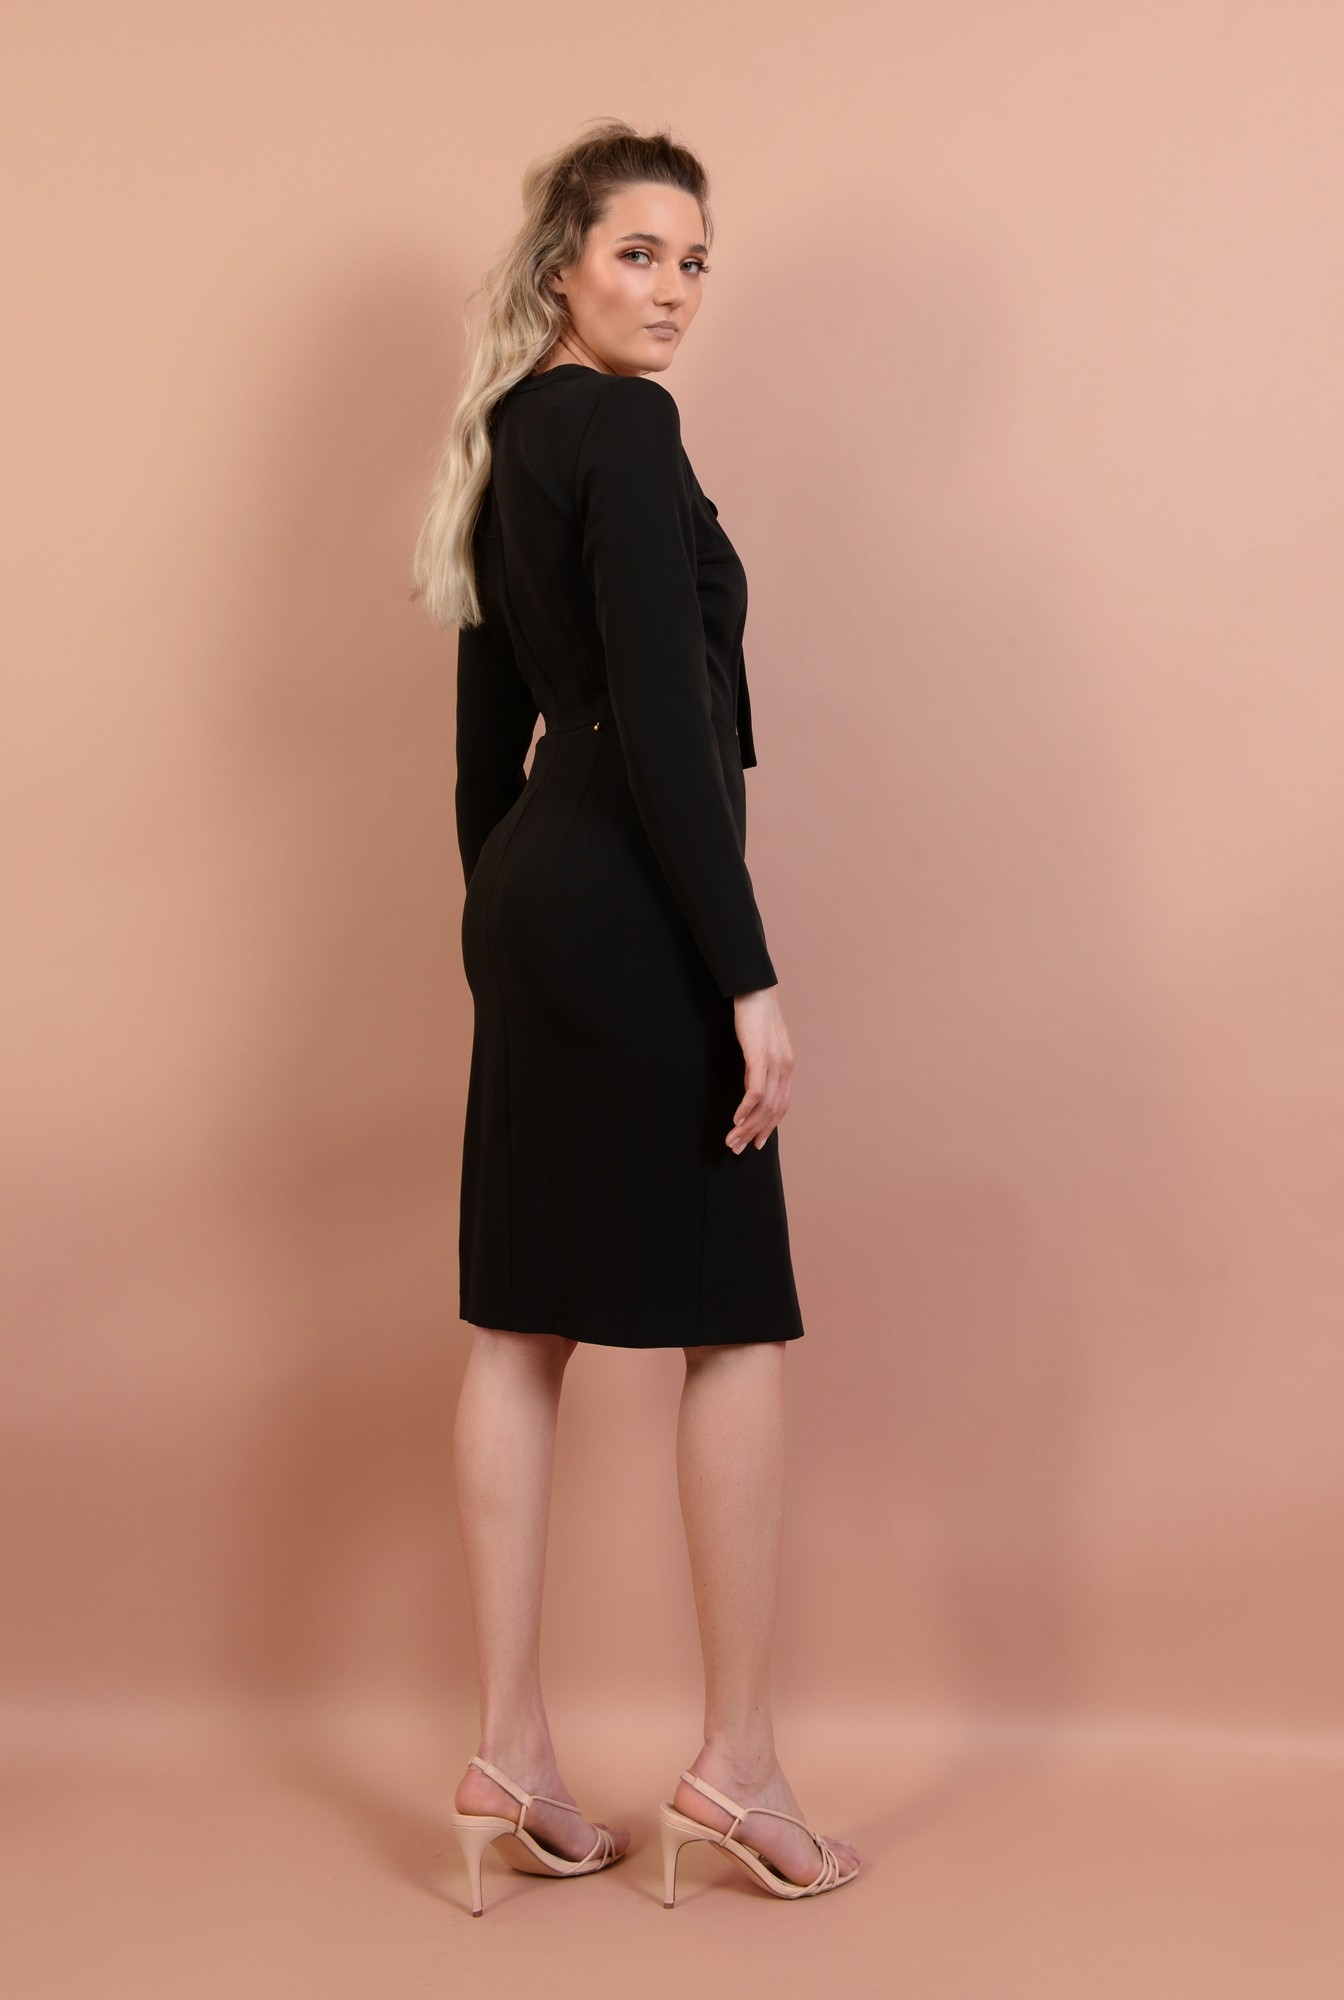 1 - 360 - rochie midi, ajustata, cu nasturi, maneci lungi, cu funda, Poema, negru